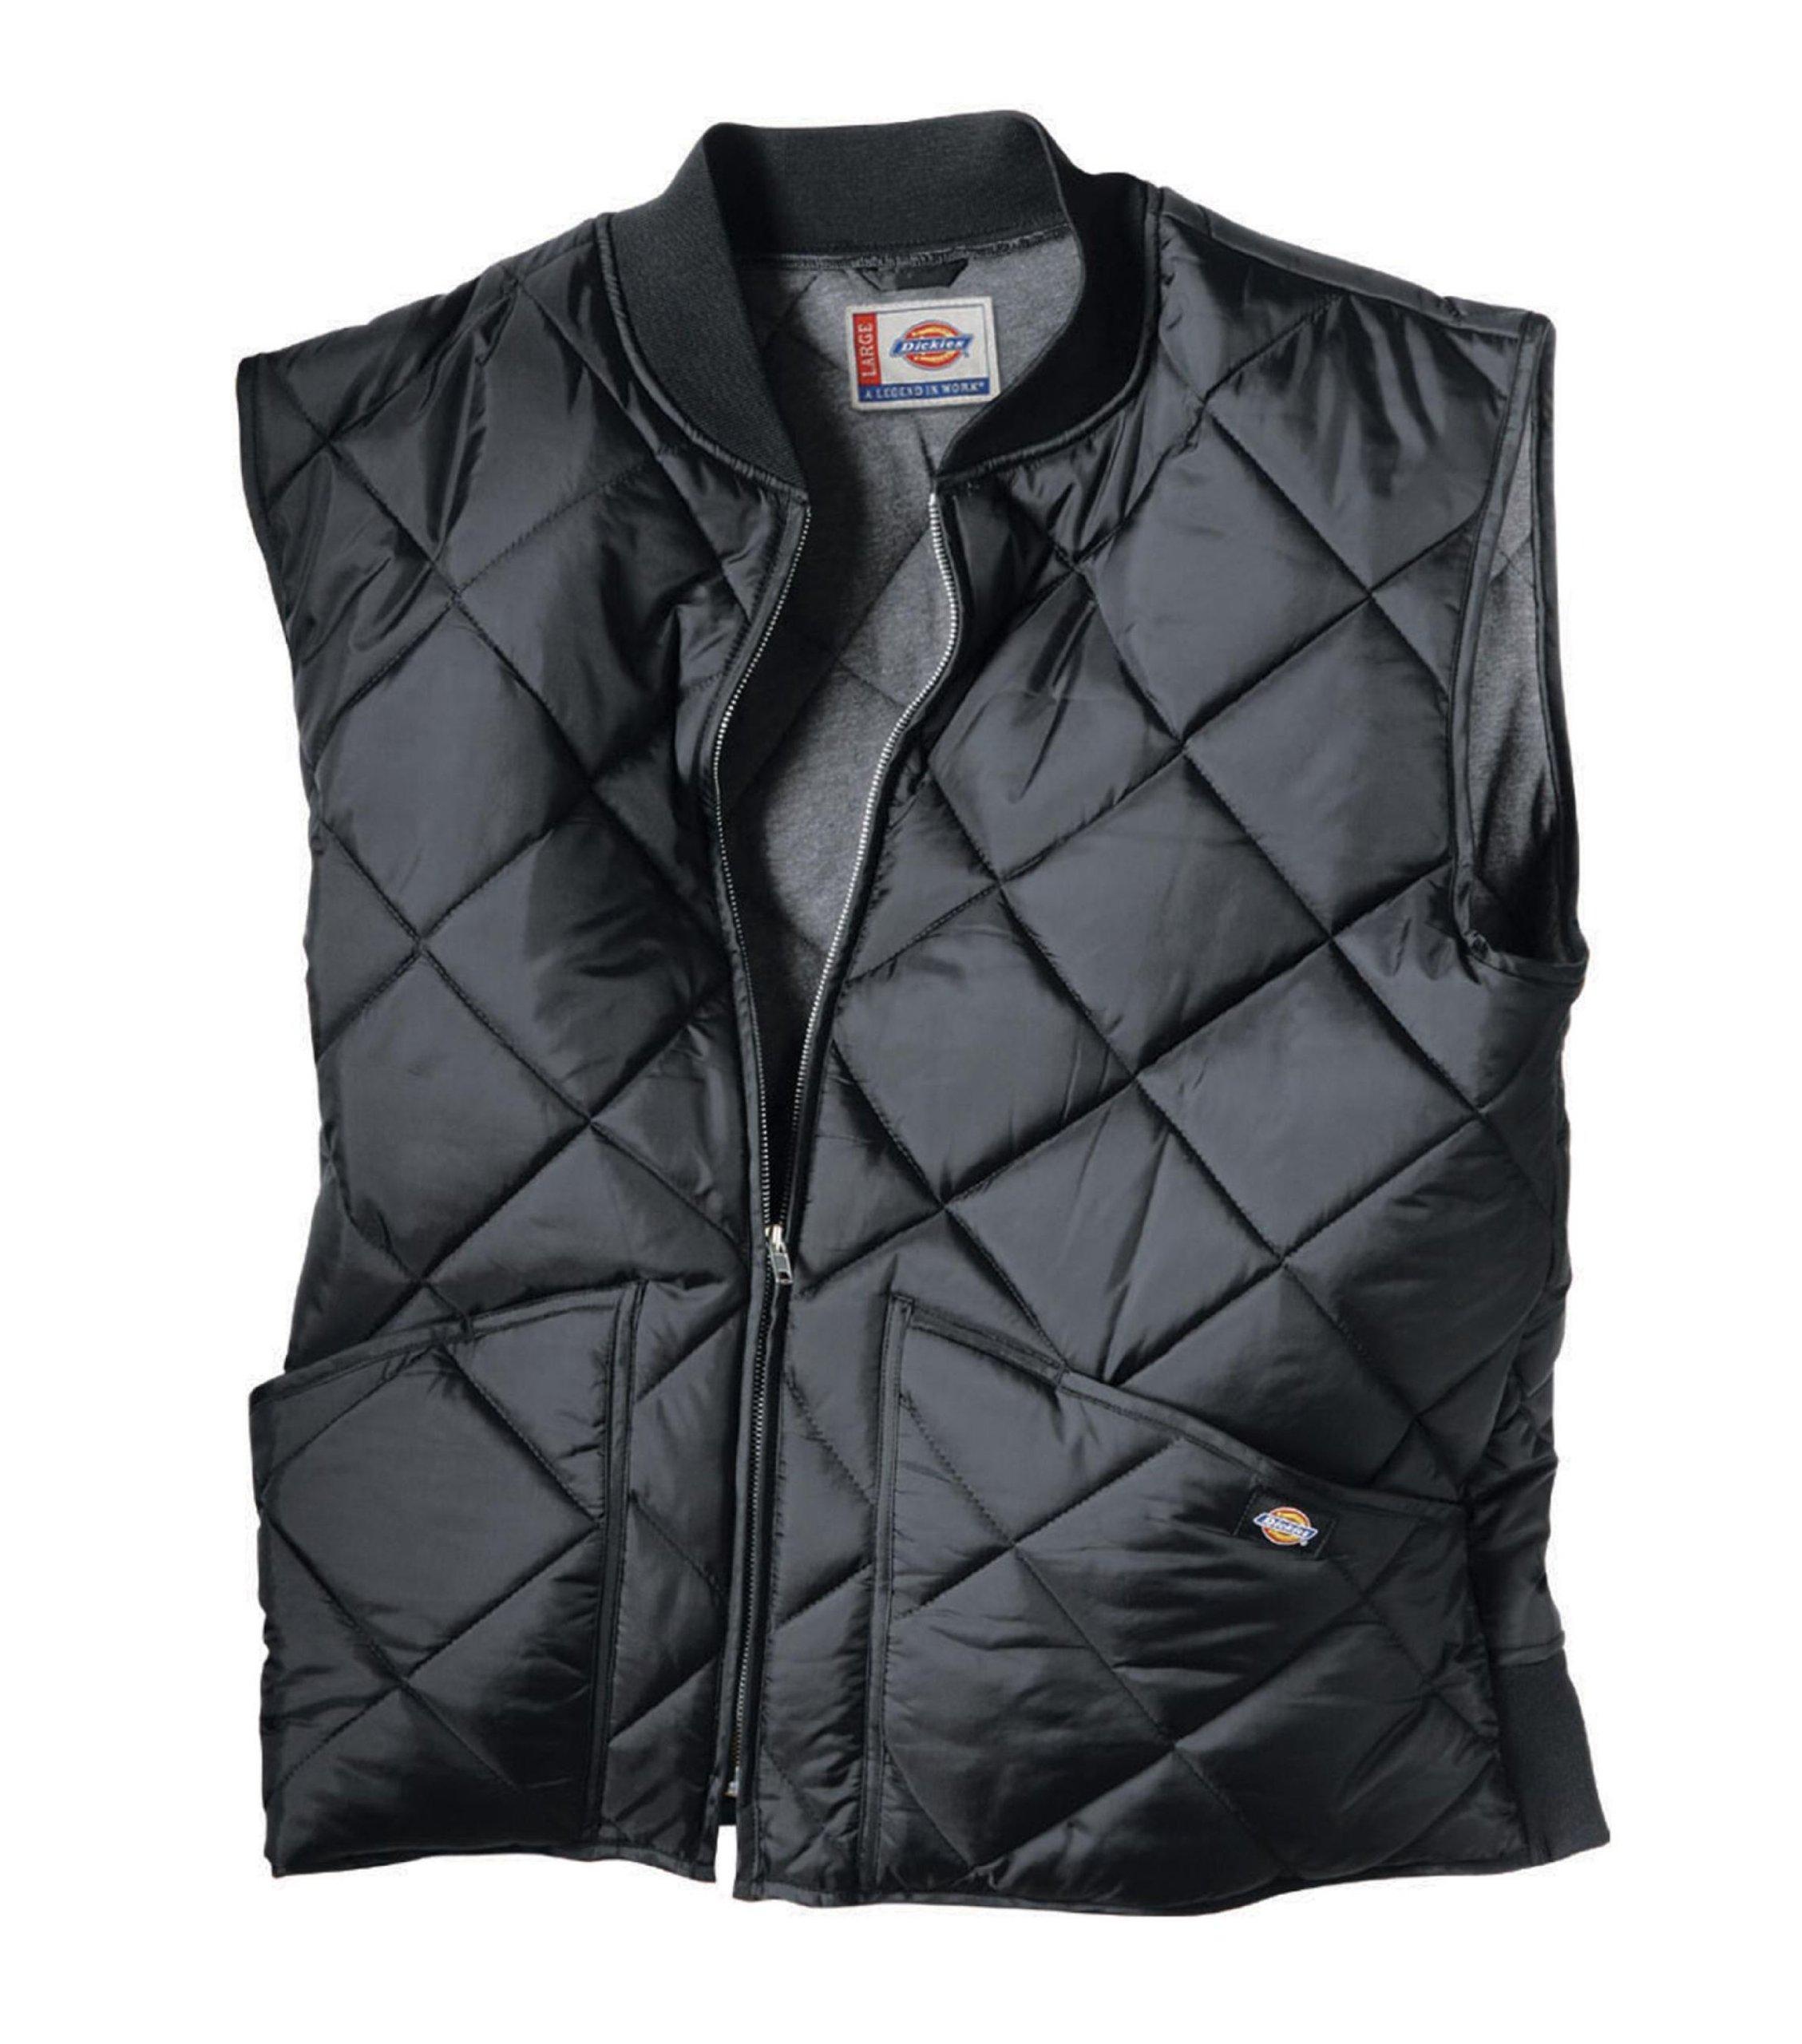 Dickies Men's Diamond Quilted Nylon Vest, Black, X-Large by Dickies